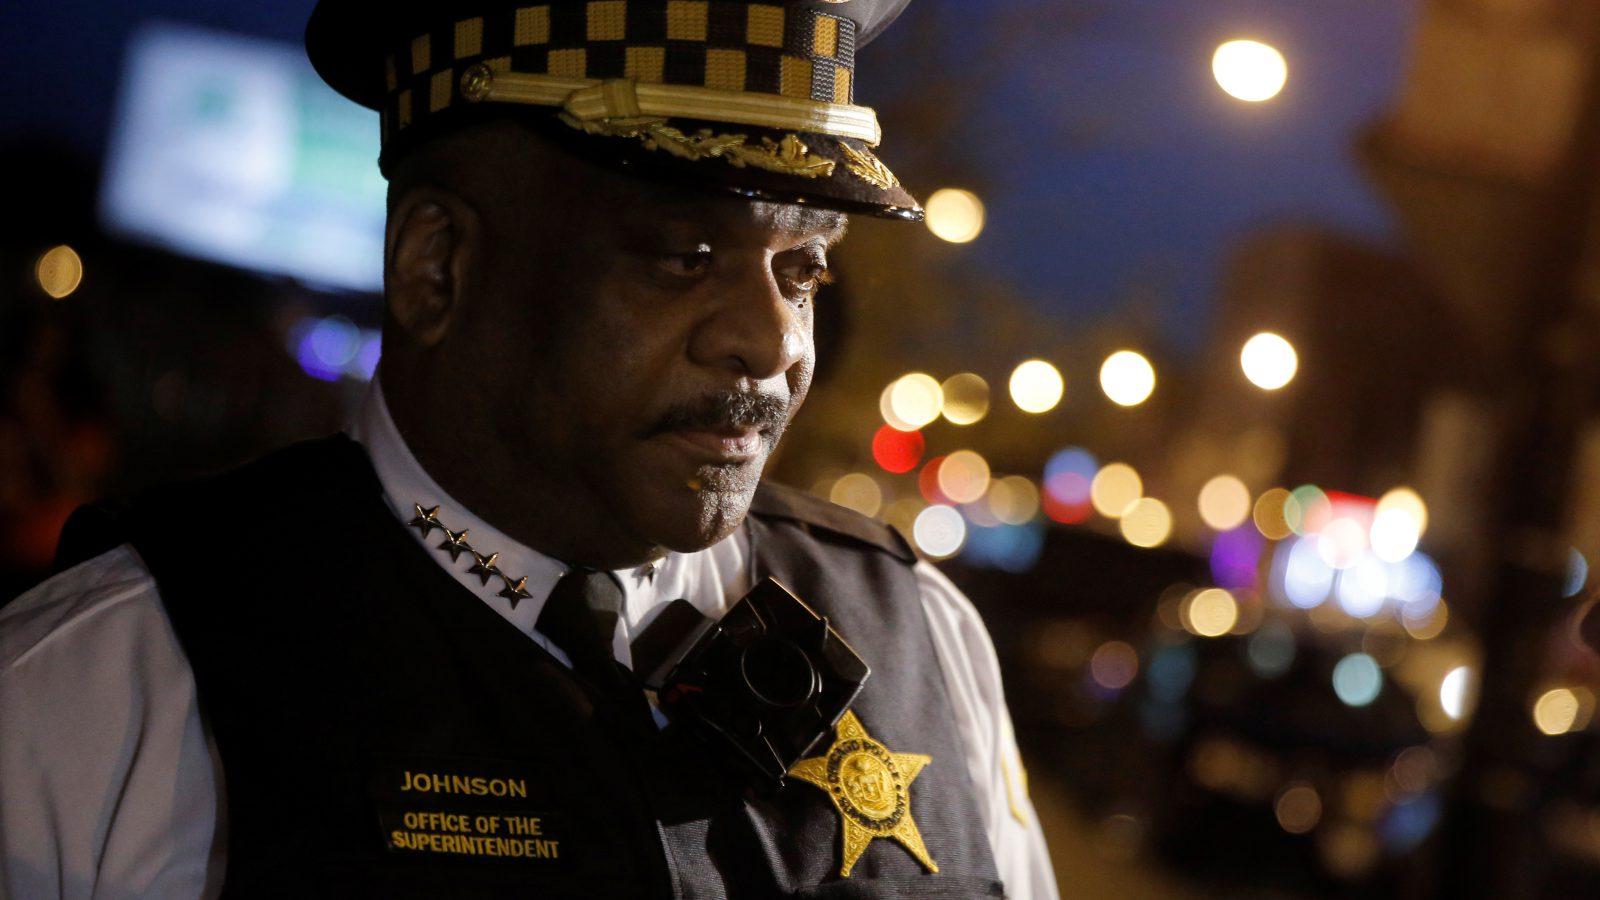 Chicago police body camera